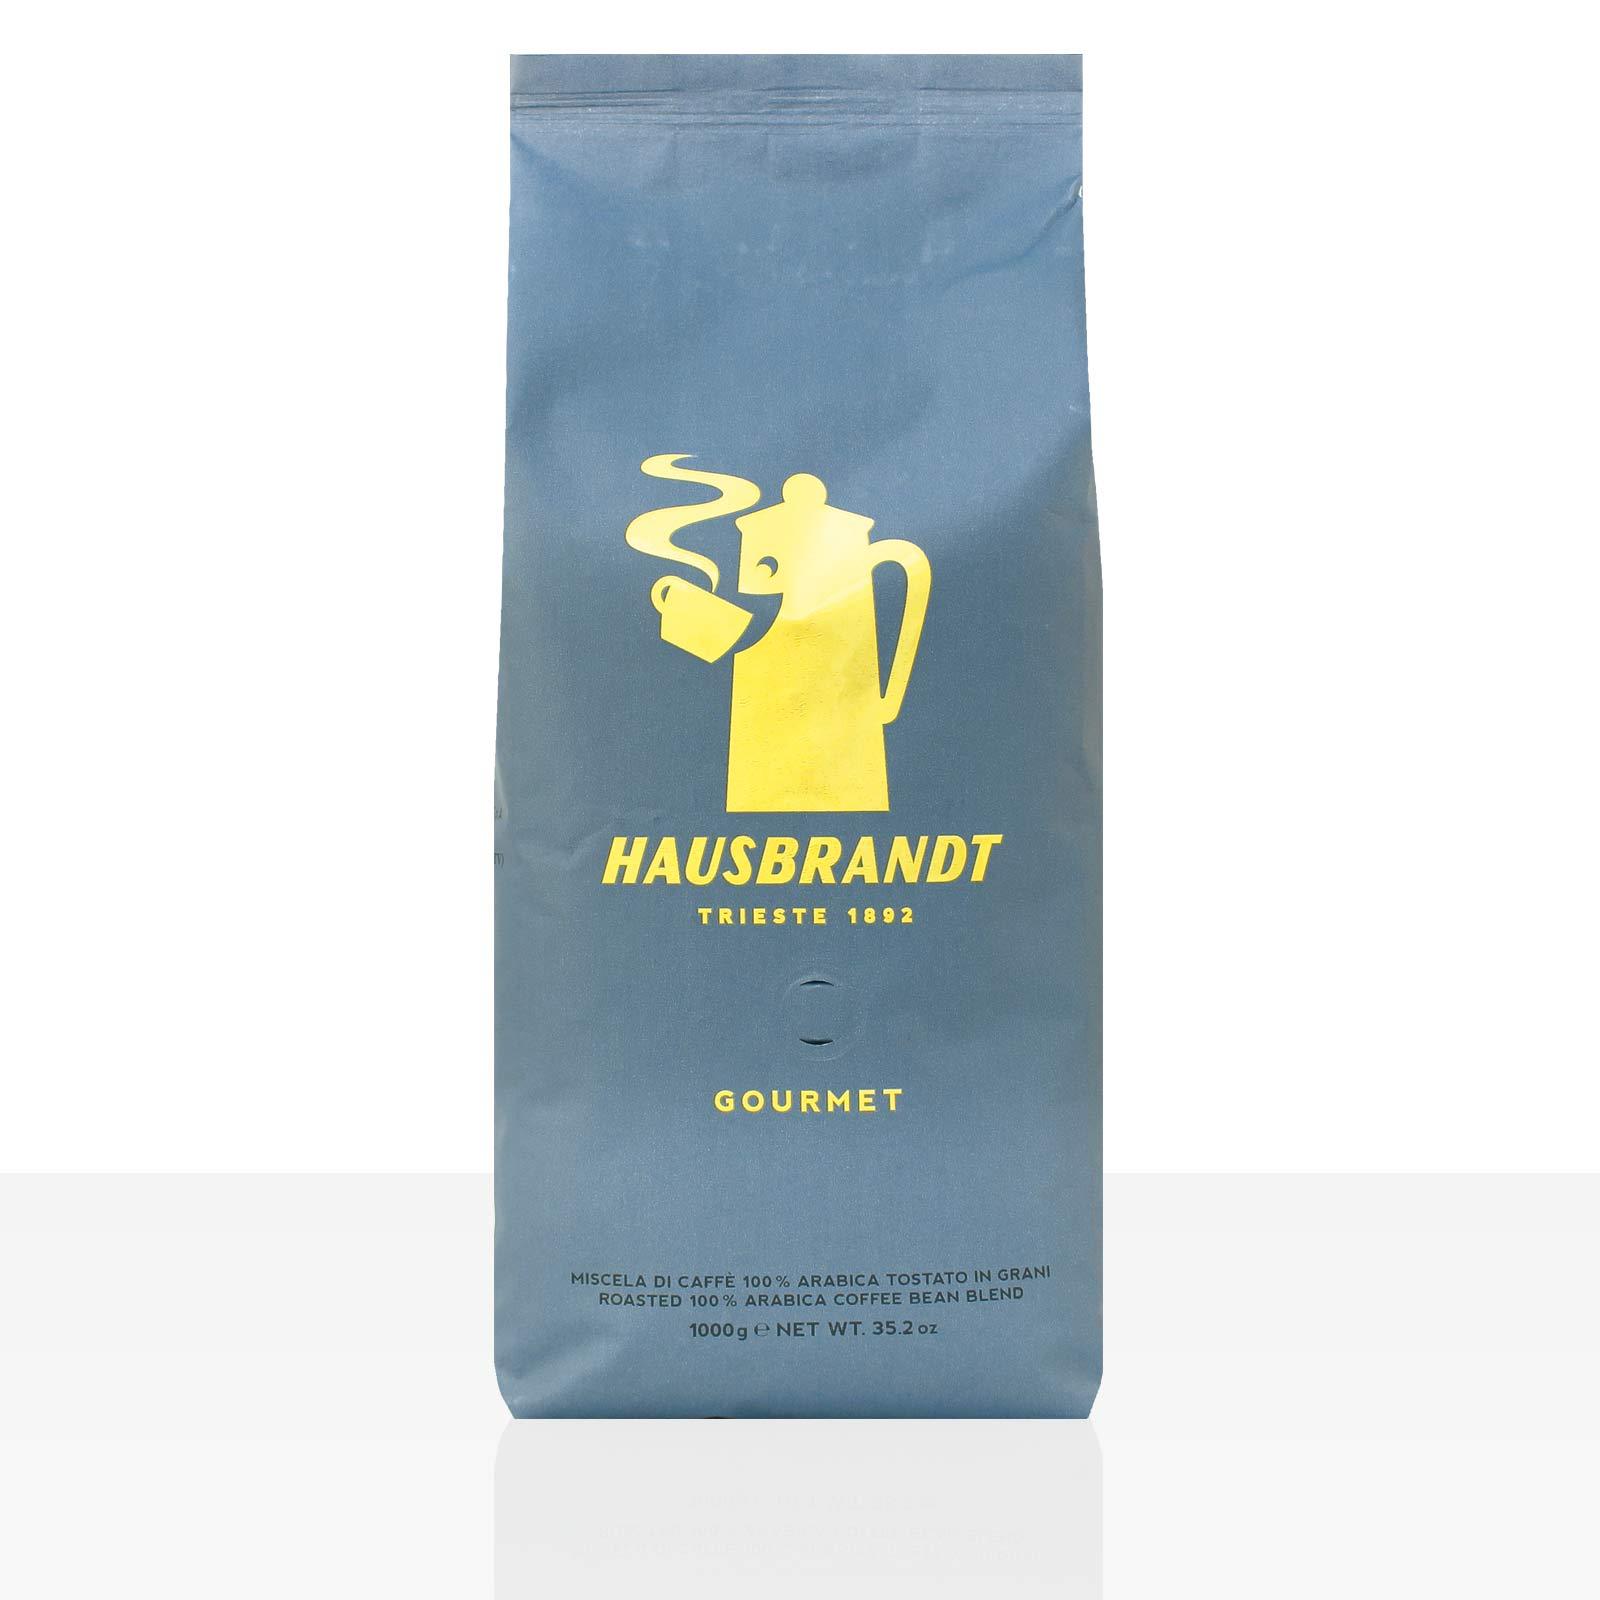 Hausbrandt Gourmet Espresso 6 x 1kg Kaffee ganze Bohne, 100% Arabica